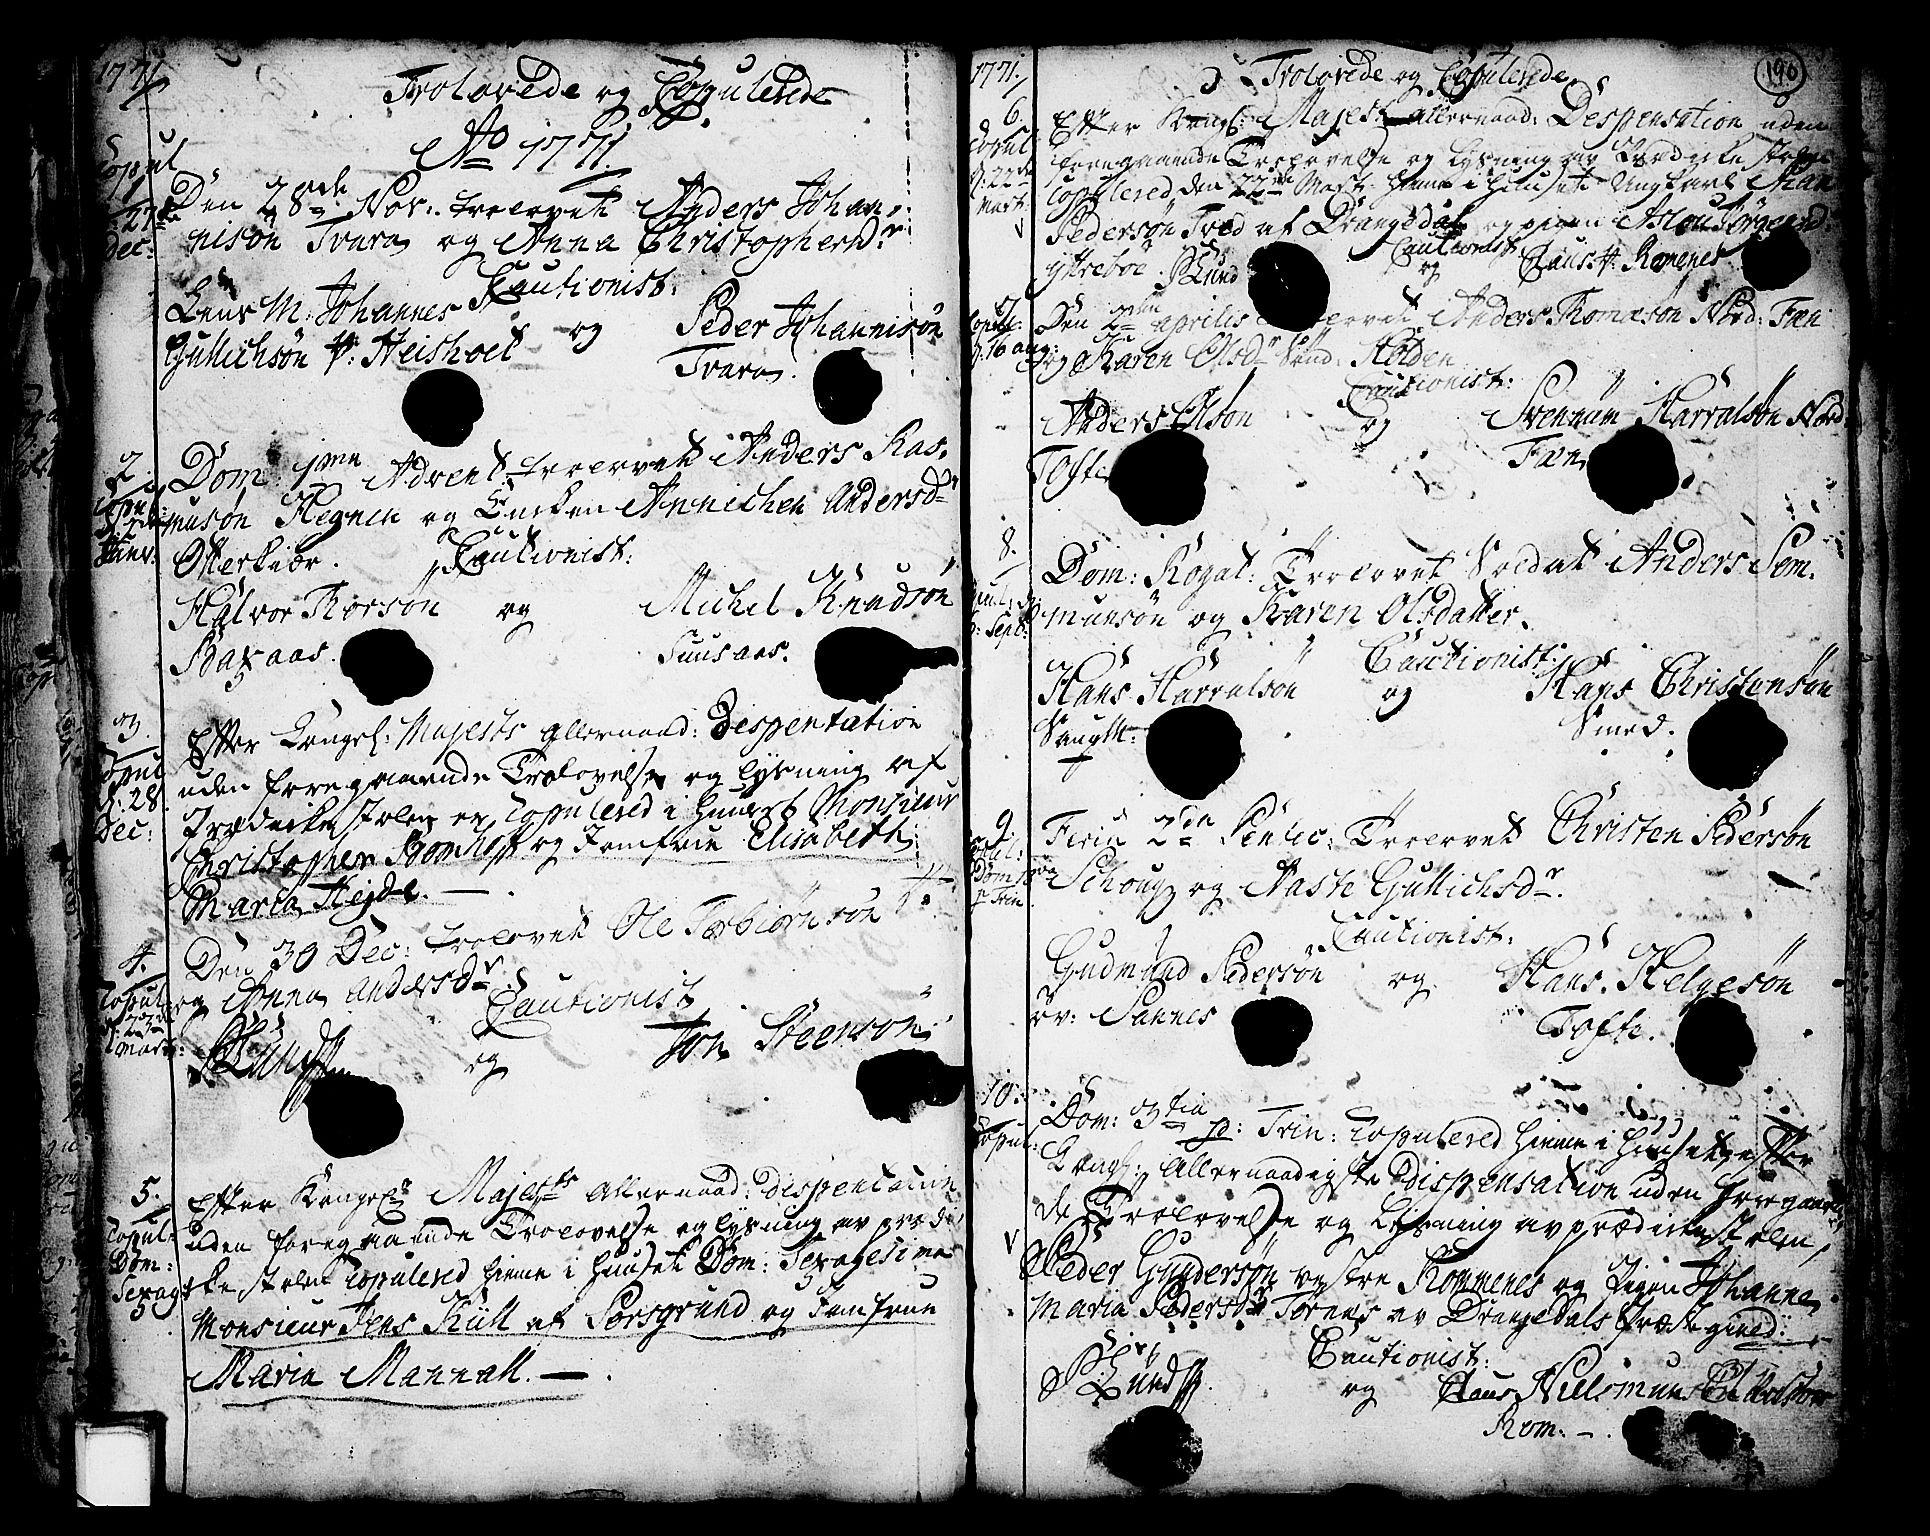 SAKO, Holla kirkebøker, F/Fa/L0001: Ministerialbok nr. 1, 1717-1779, s. 190